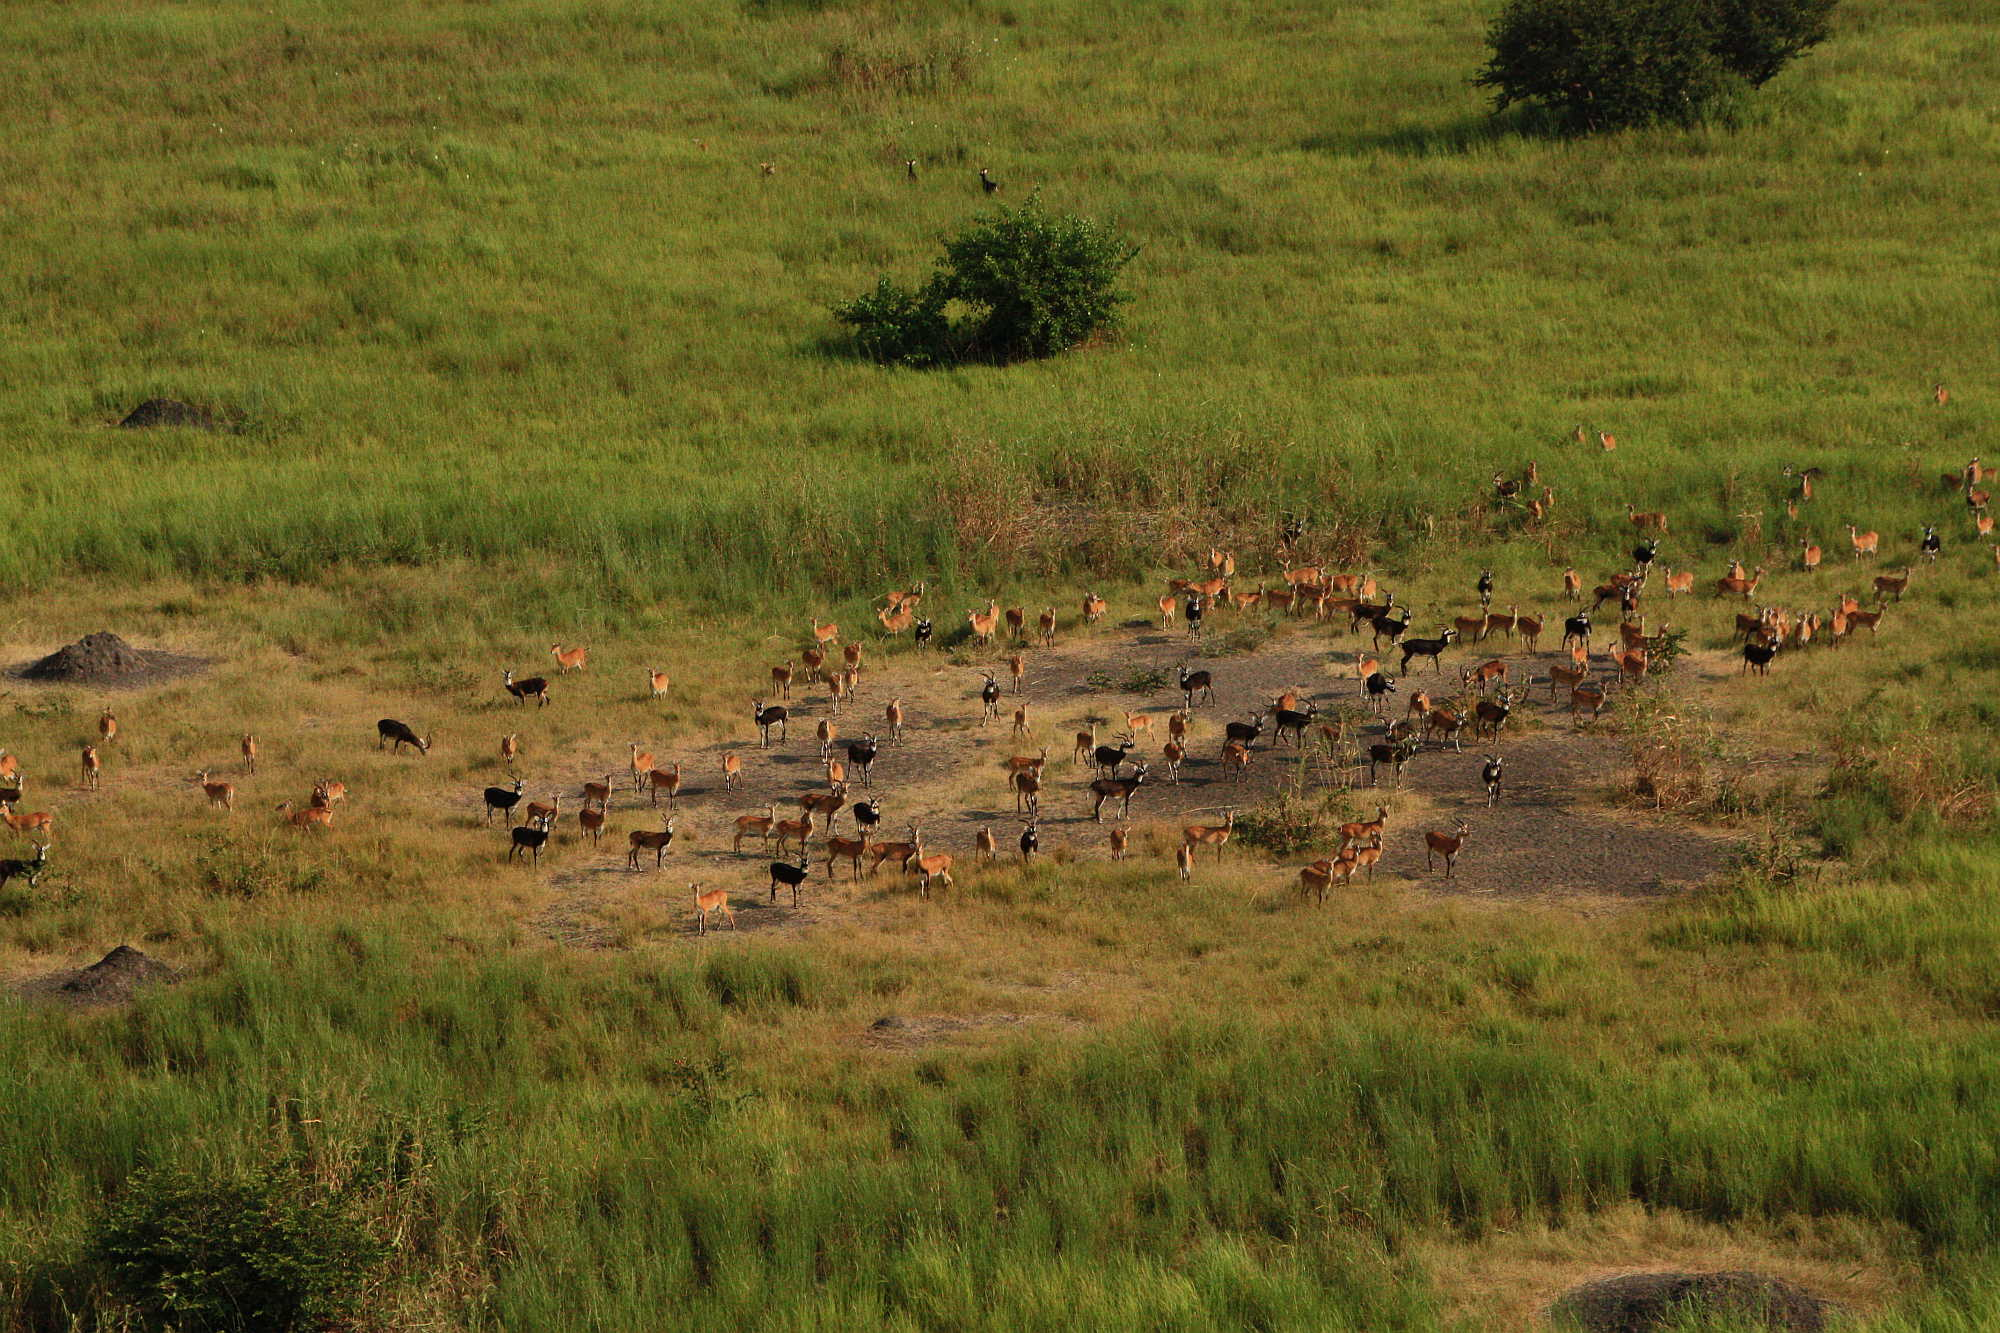 kob-migration-gambella-national-park